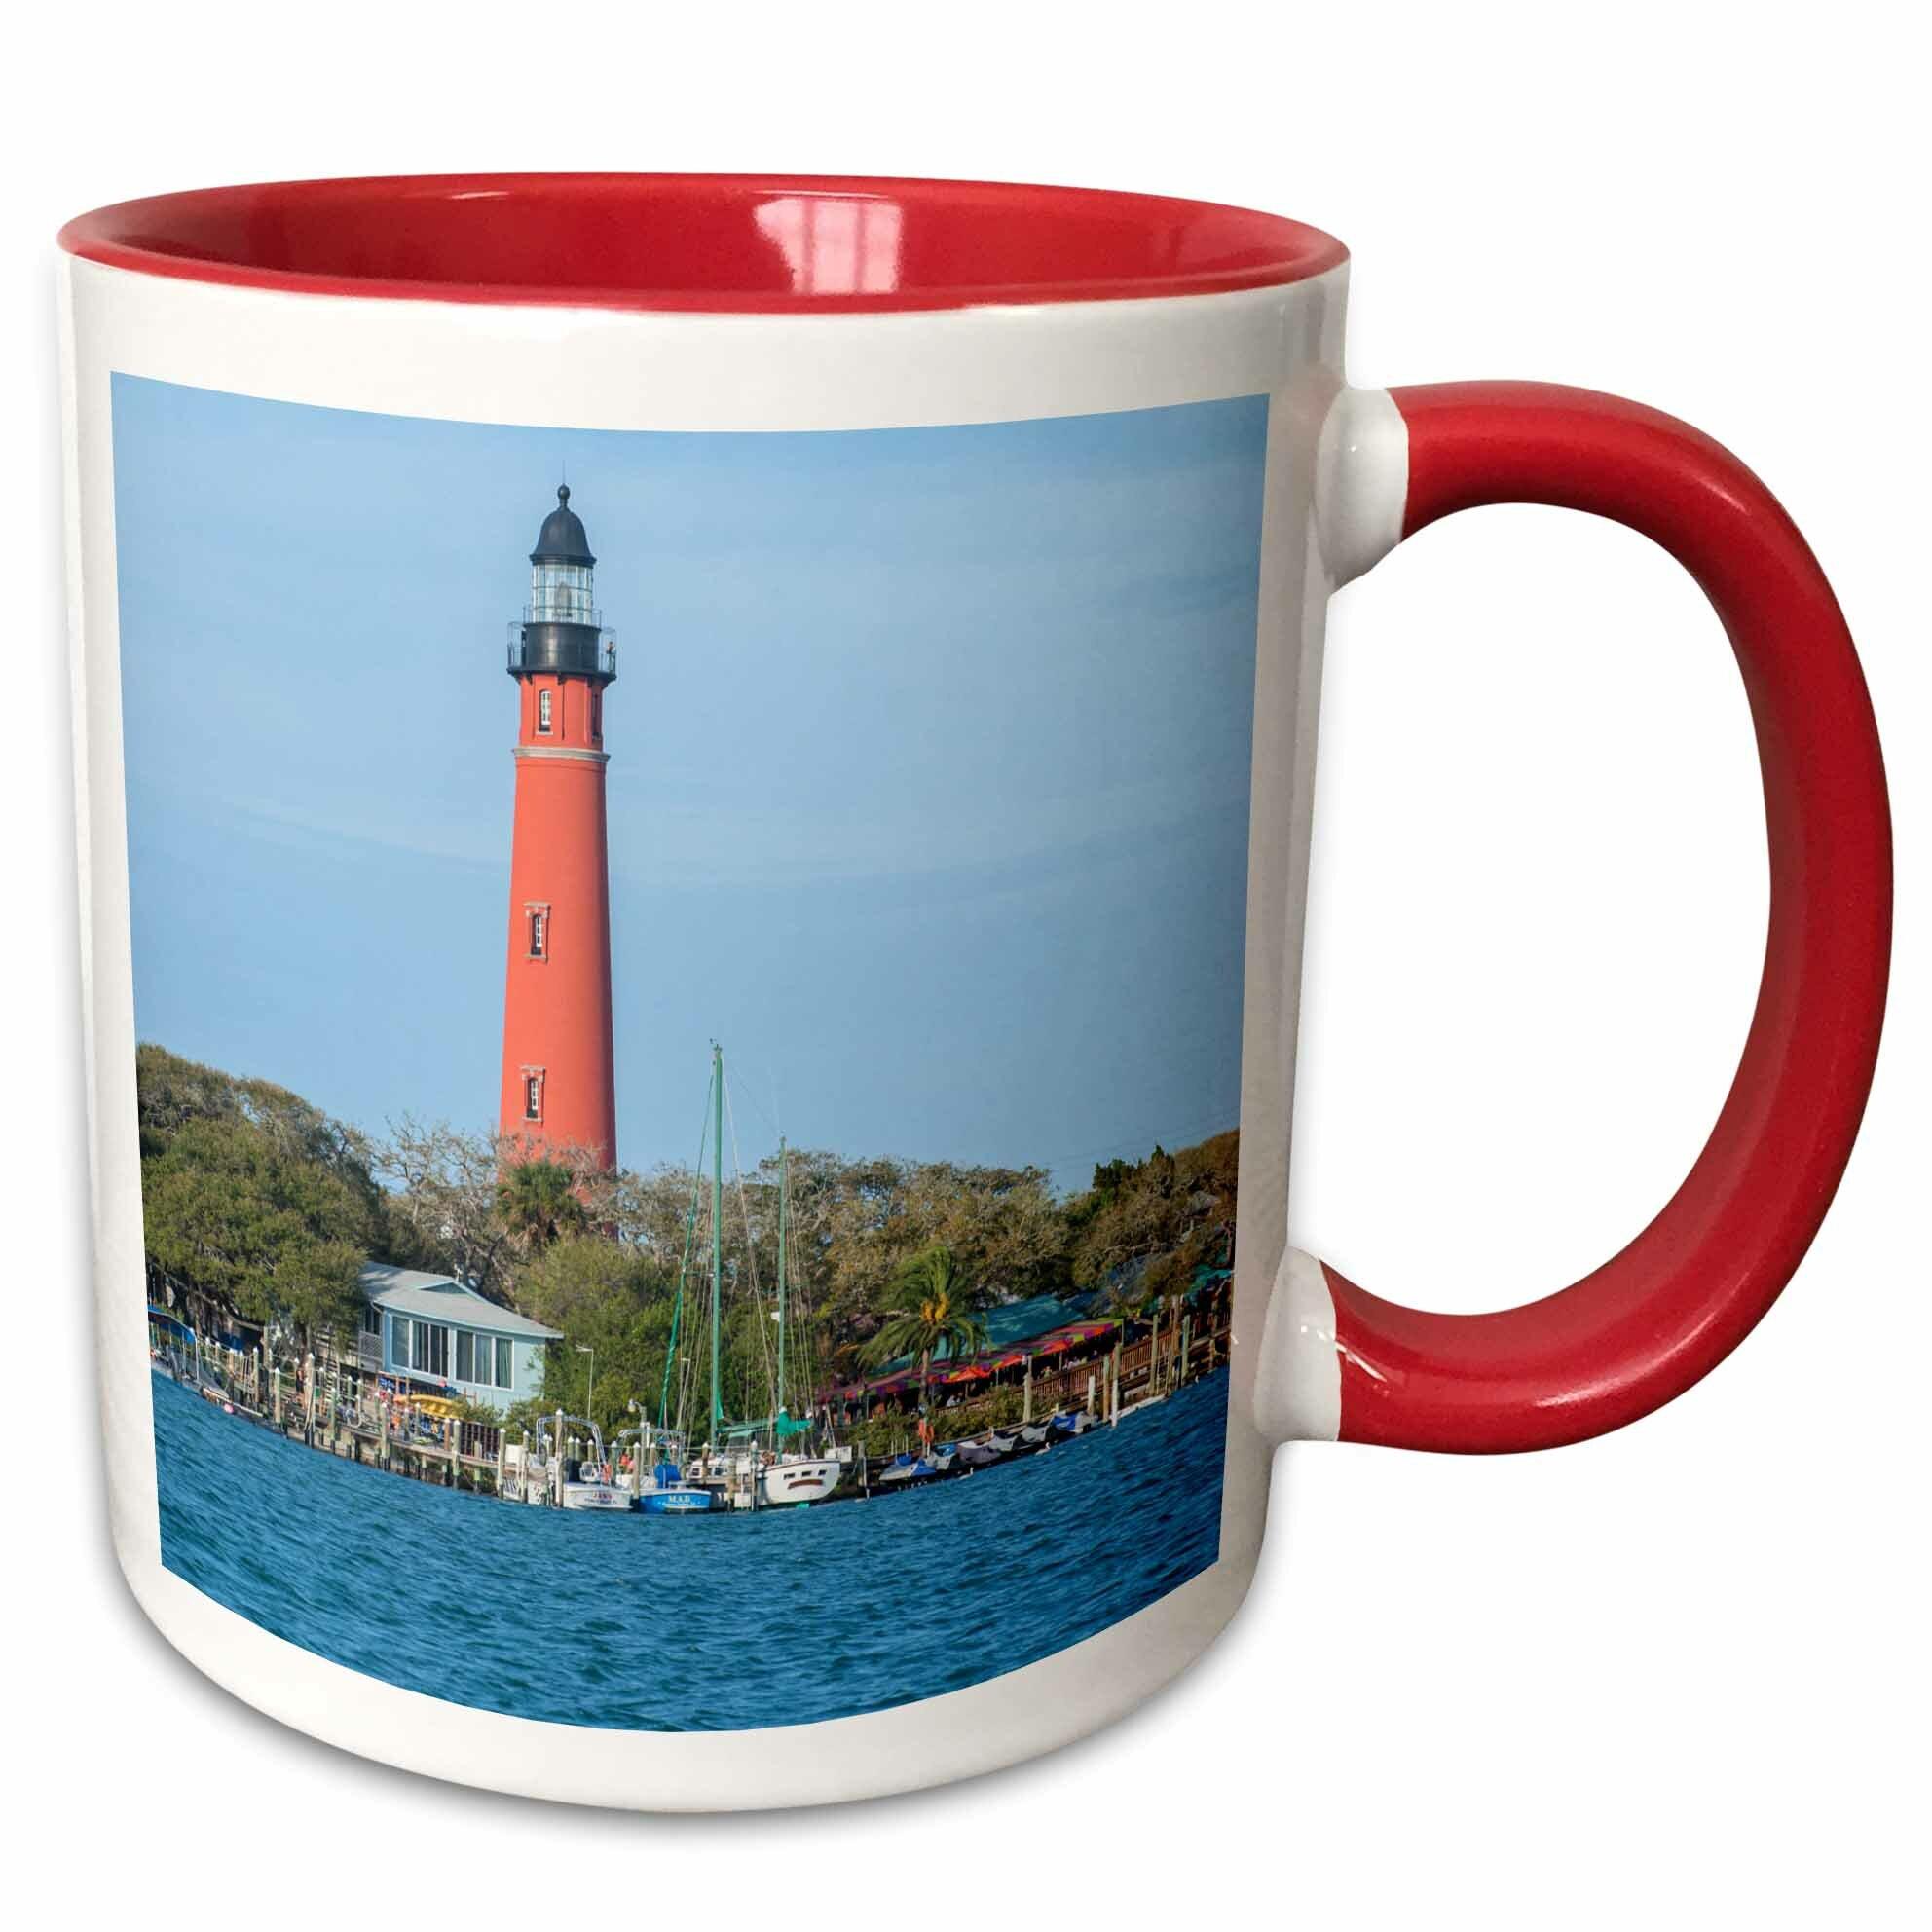 Symple Stuff Rosso Usa Florida Ponce Inlet Ponce De Leon Inlet Lighthouse Coffee Mug Wayfair